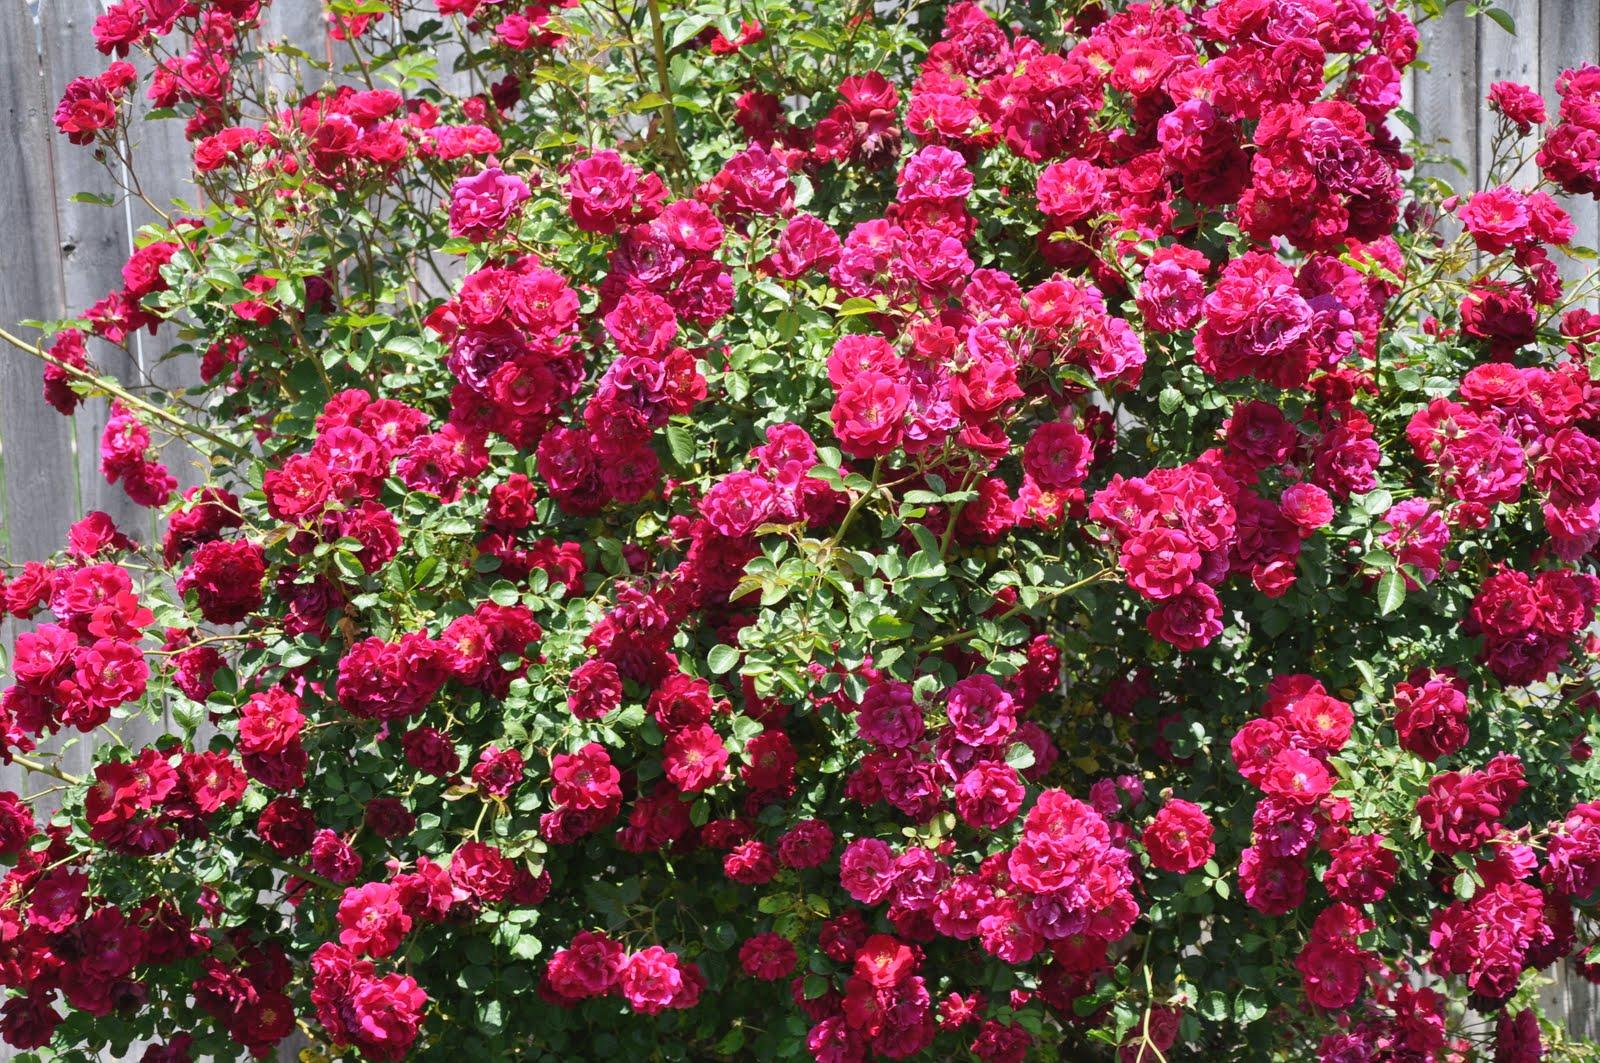 Graham Canyon: Texas Roses From Grandma Bev's Backyard